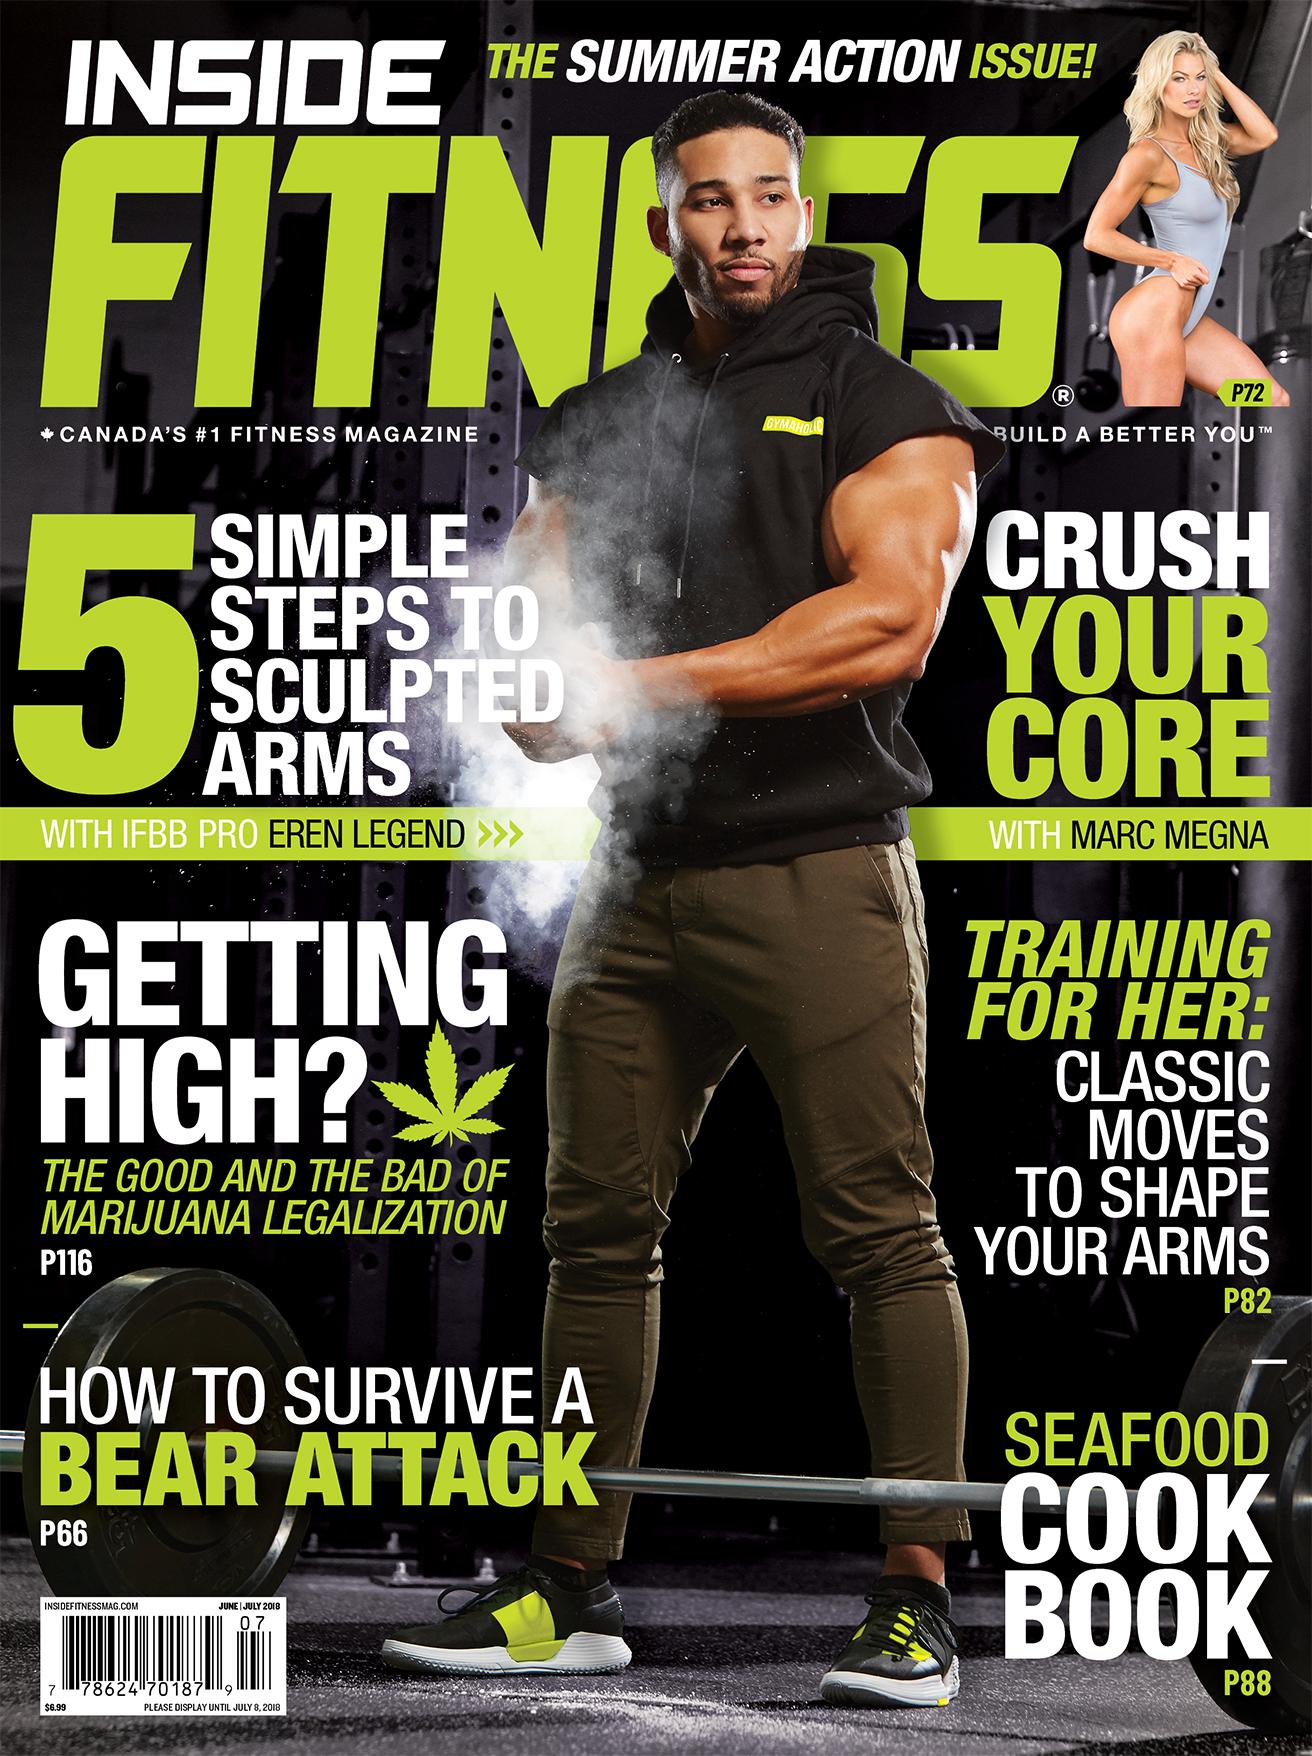 IFM76-Inine Fitness Photography.jpg